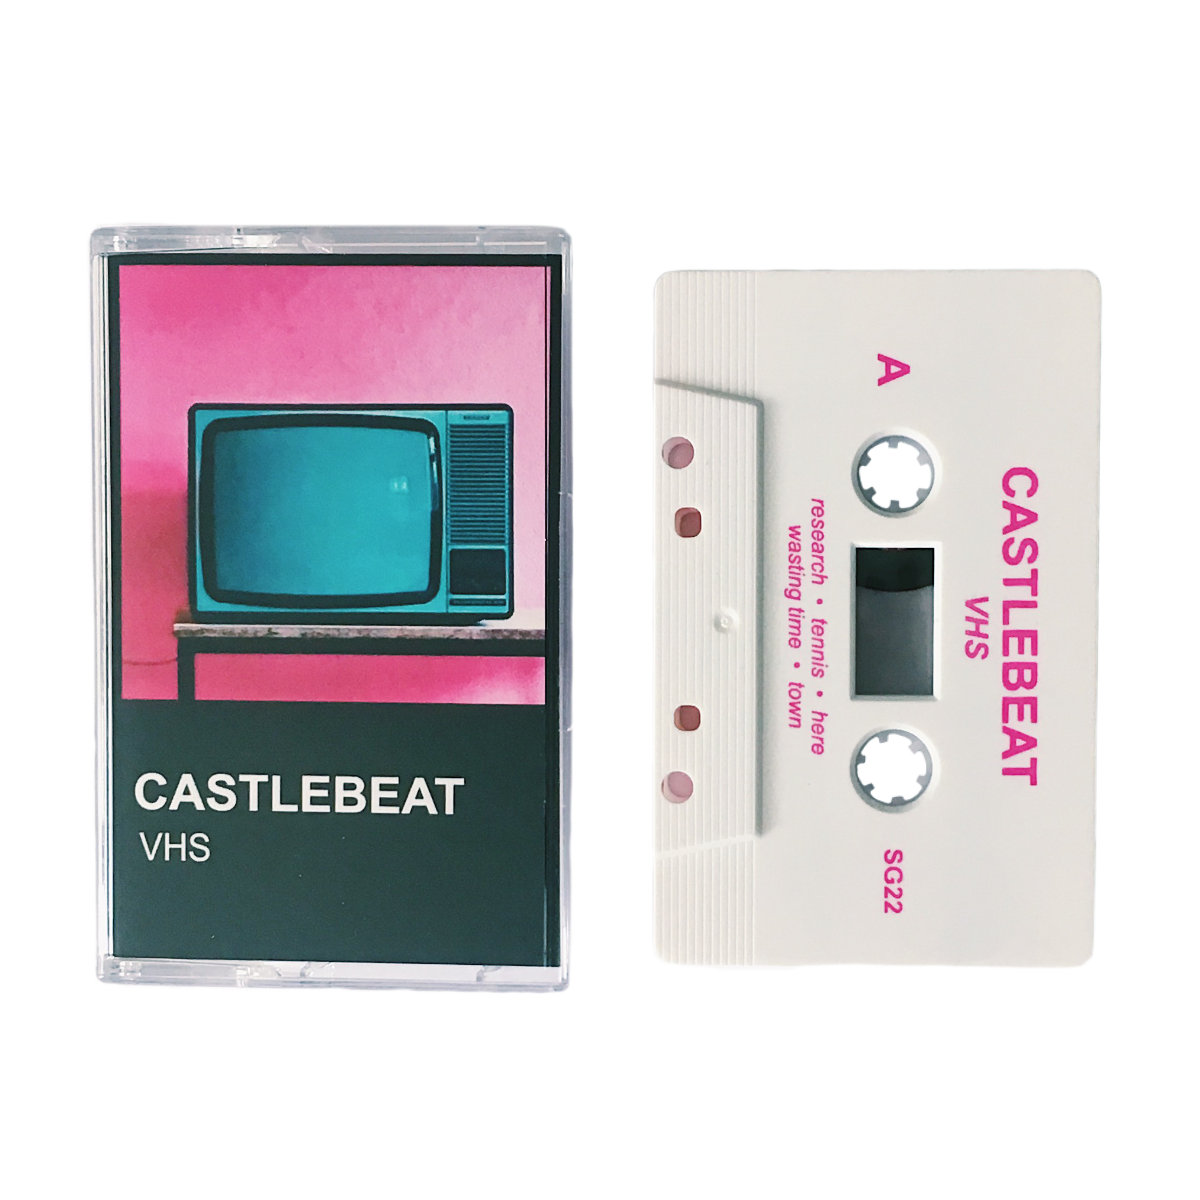 Tennis Castlebeat